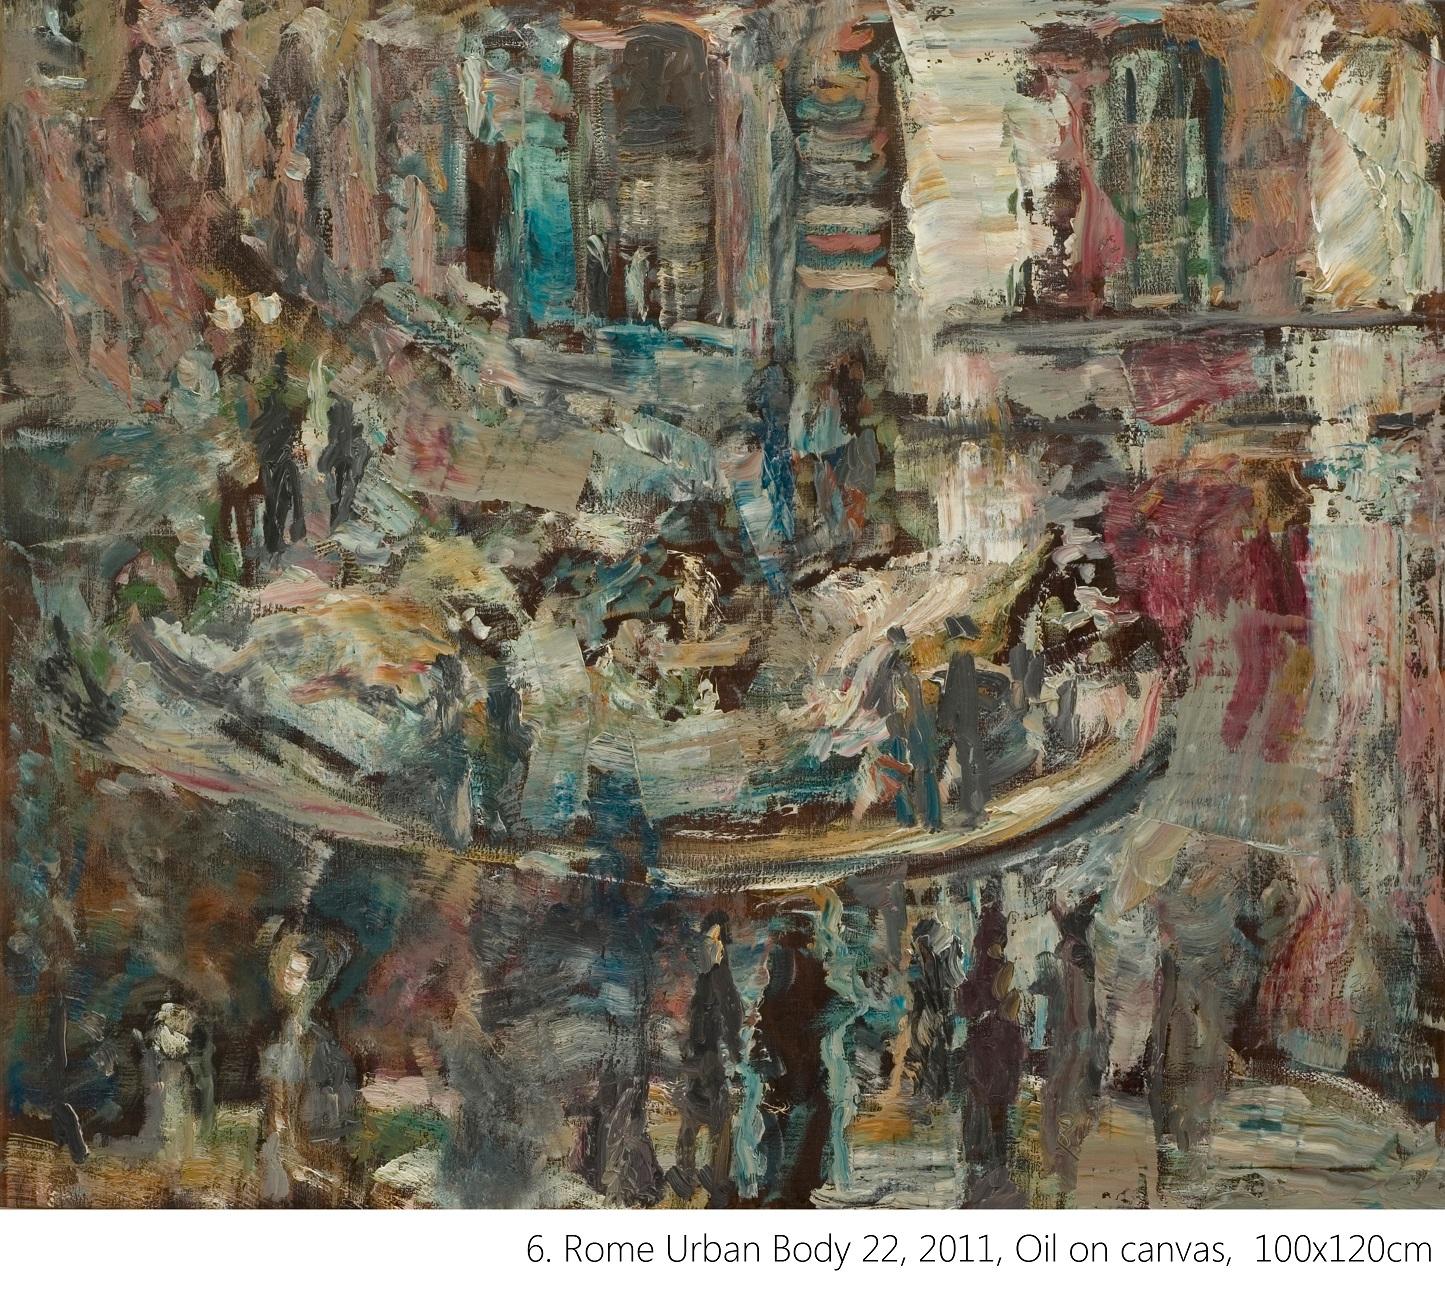 6. Rome Urban Body 22, 2011, Oil on canvas, 100x120cm